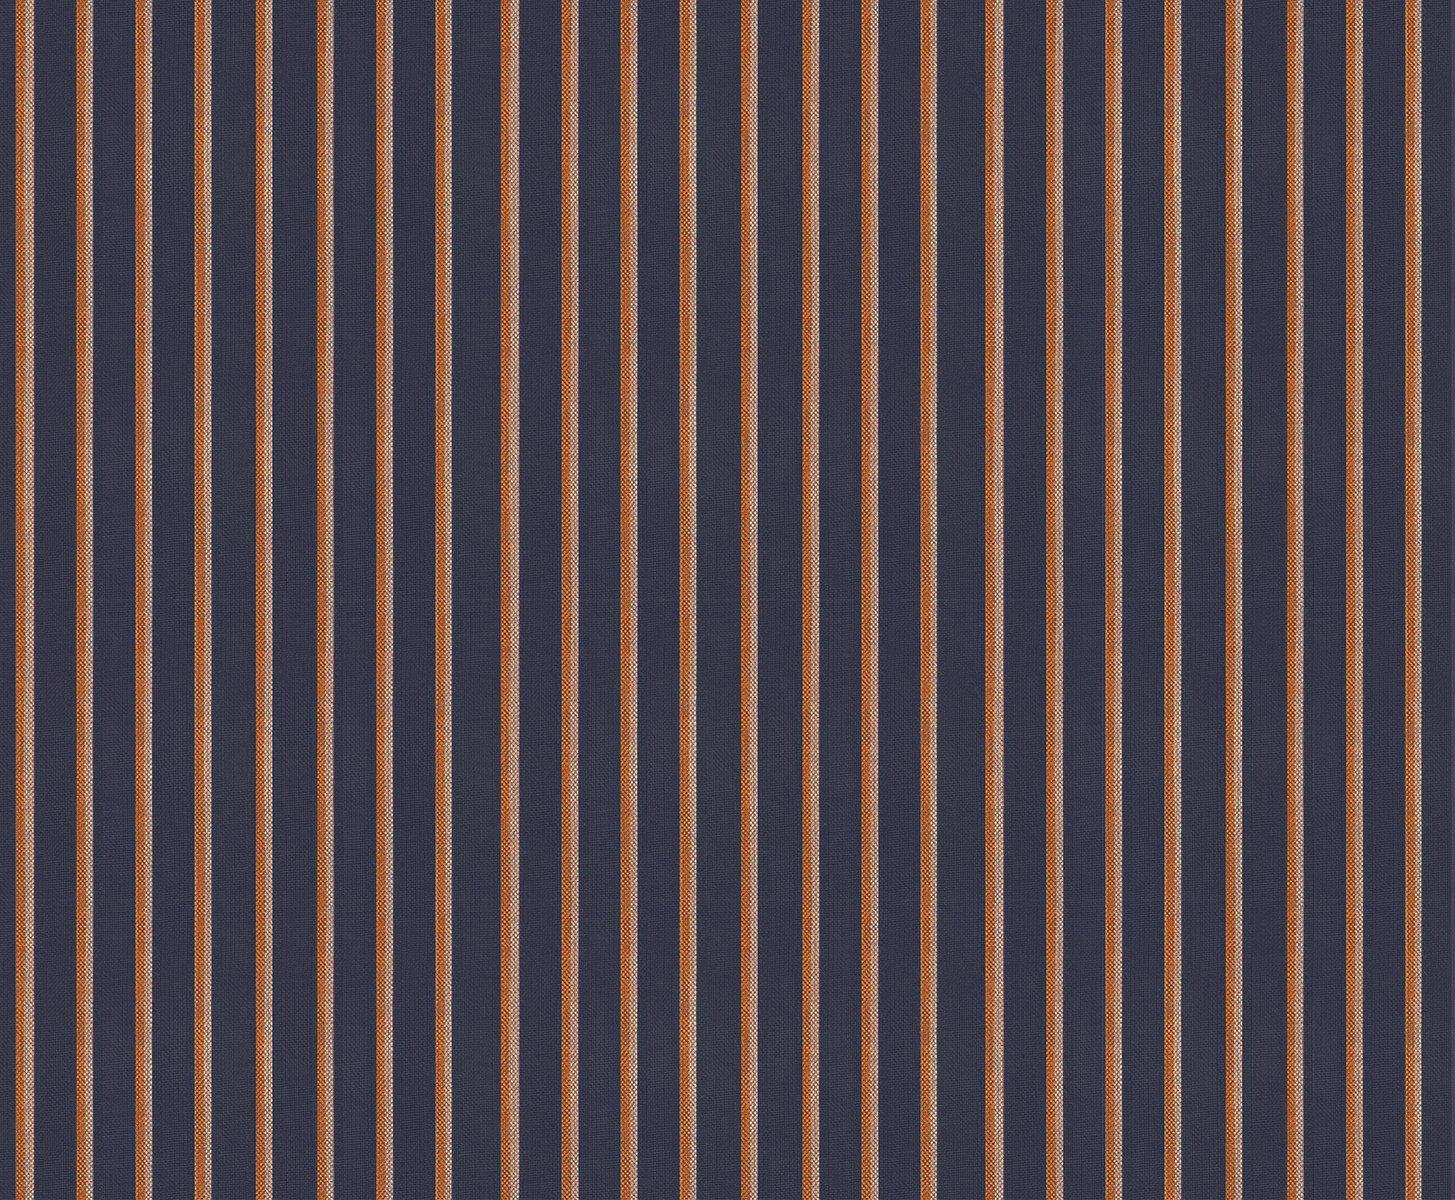 Ruby Star Society Warp & Weft Heirloom Yarn-Dyed Wovens - Shirtwaist - Navy